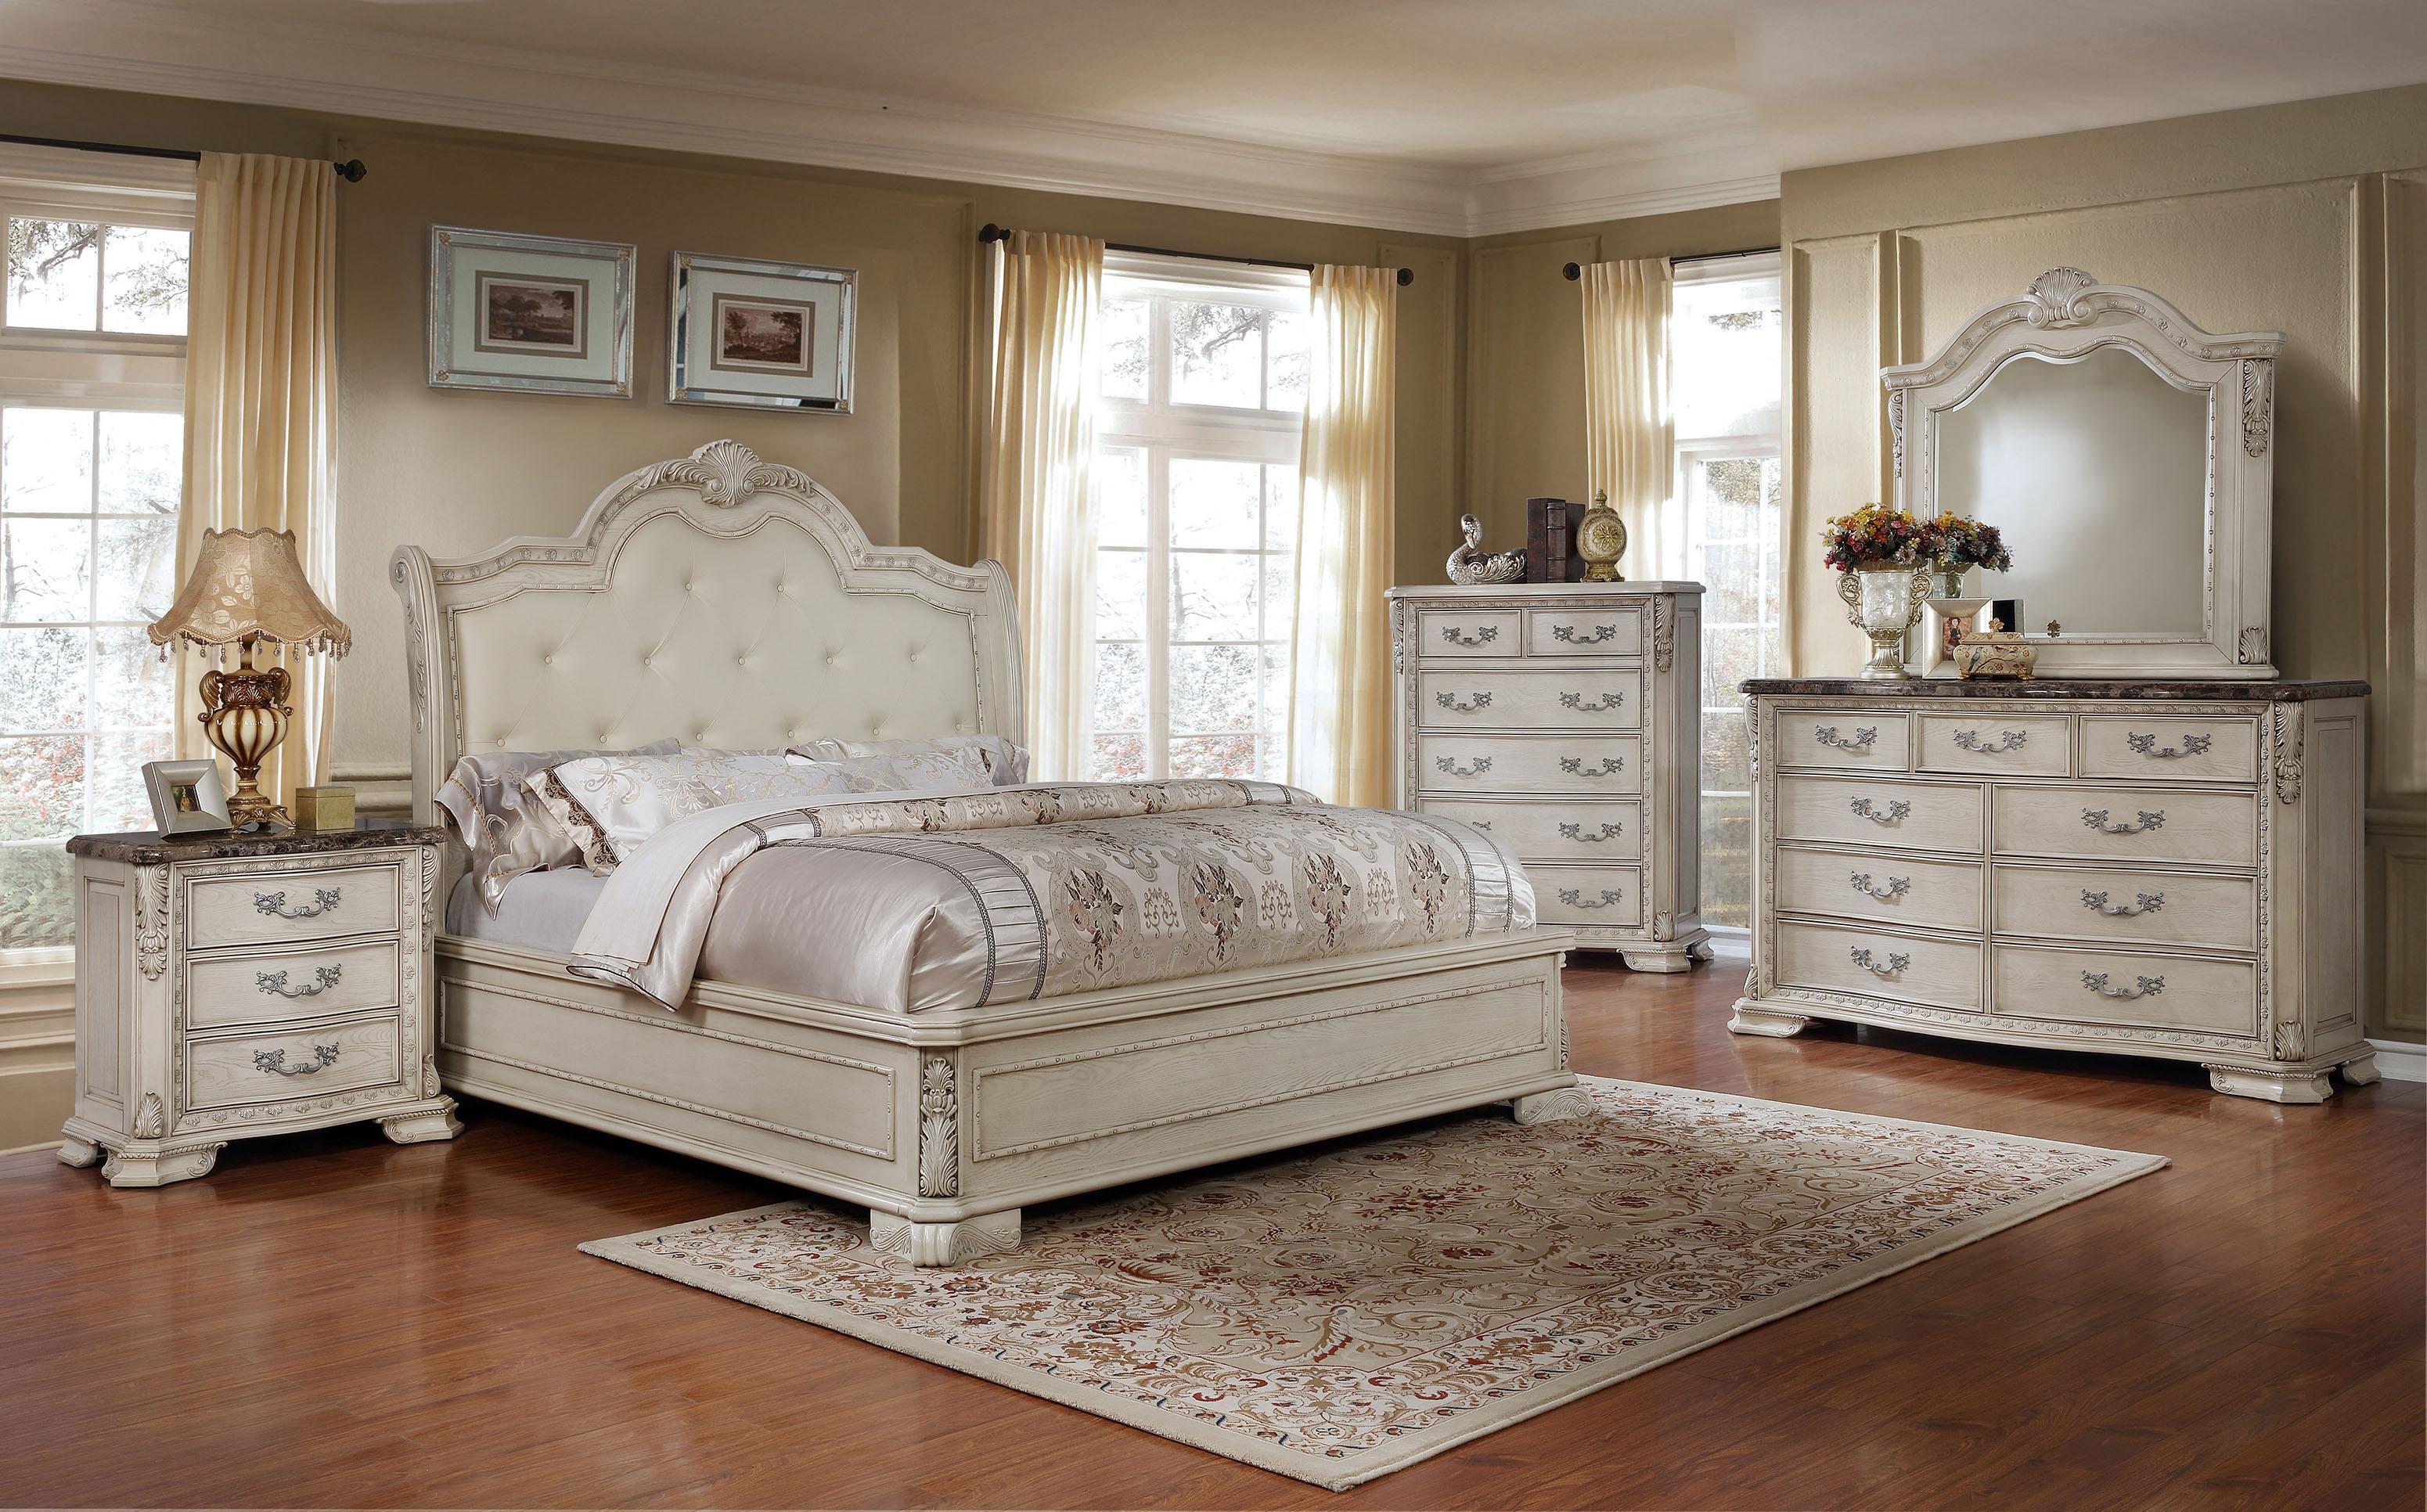 antique white tufted king size bedroom set 4pcs